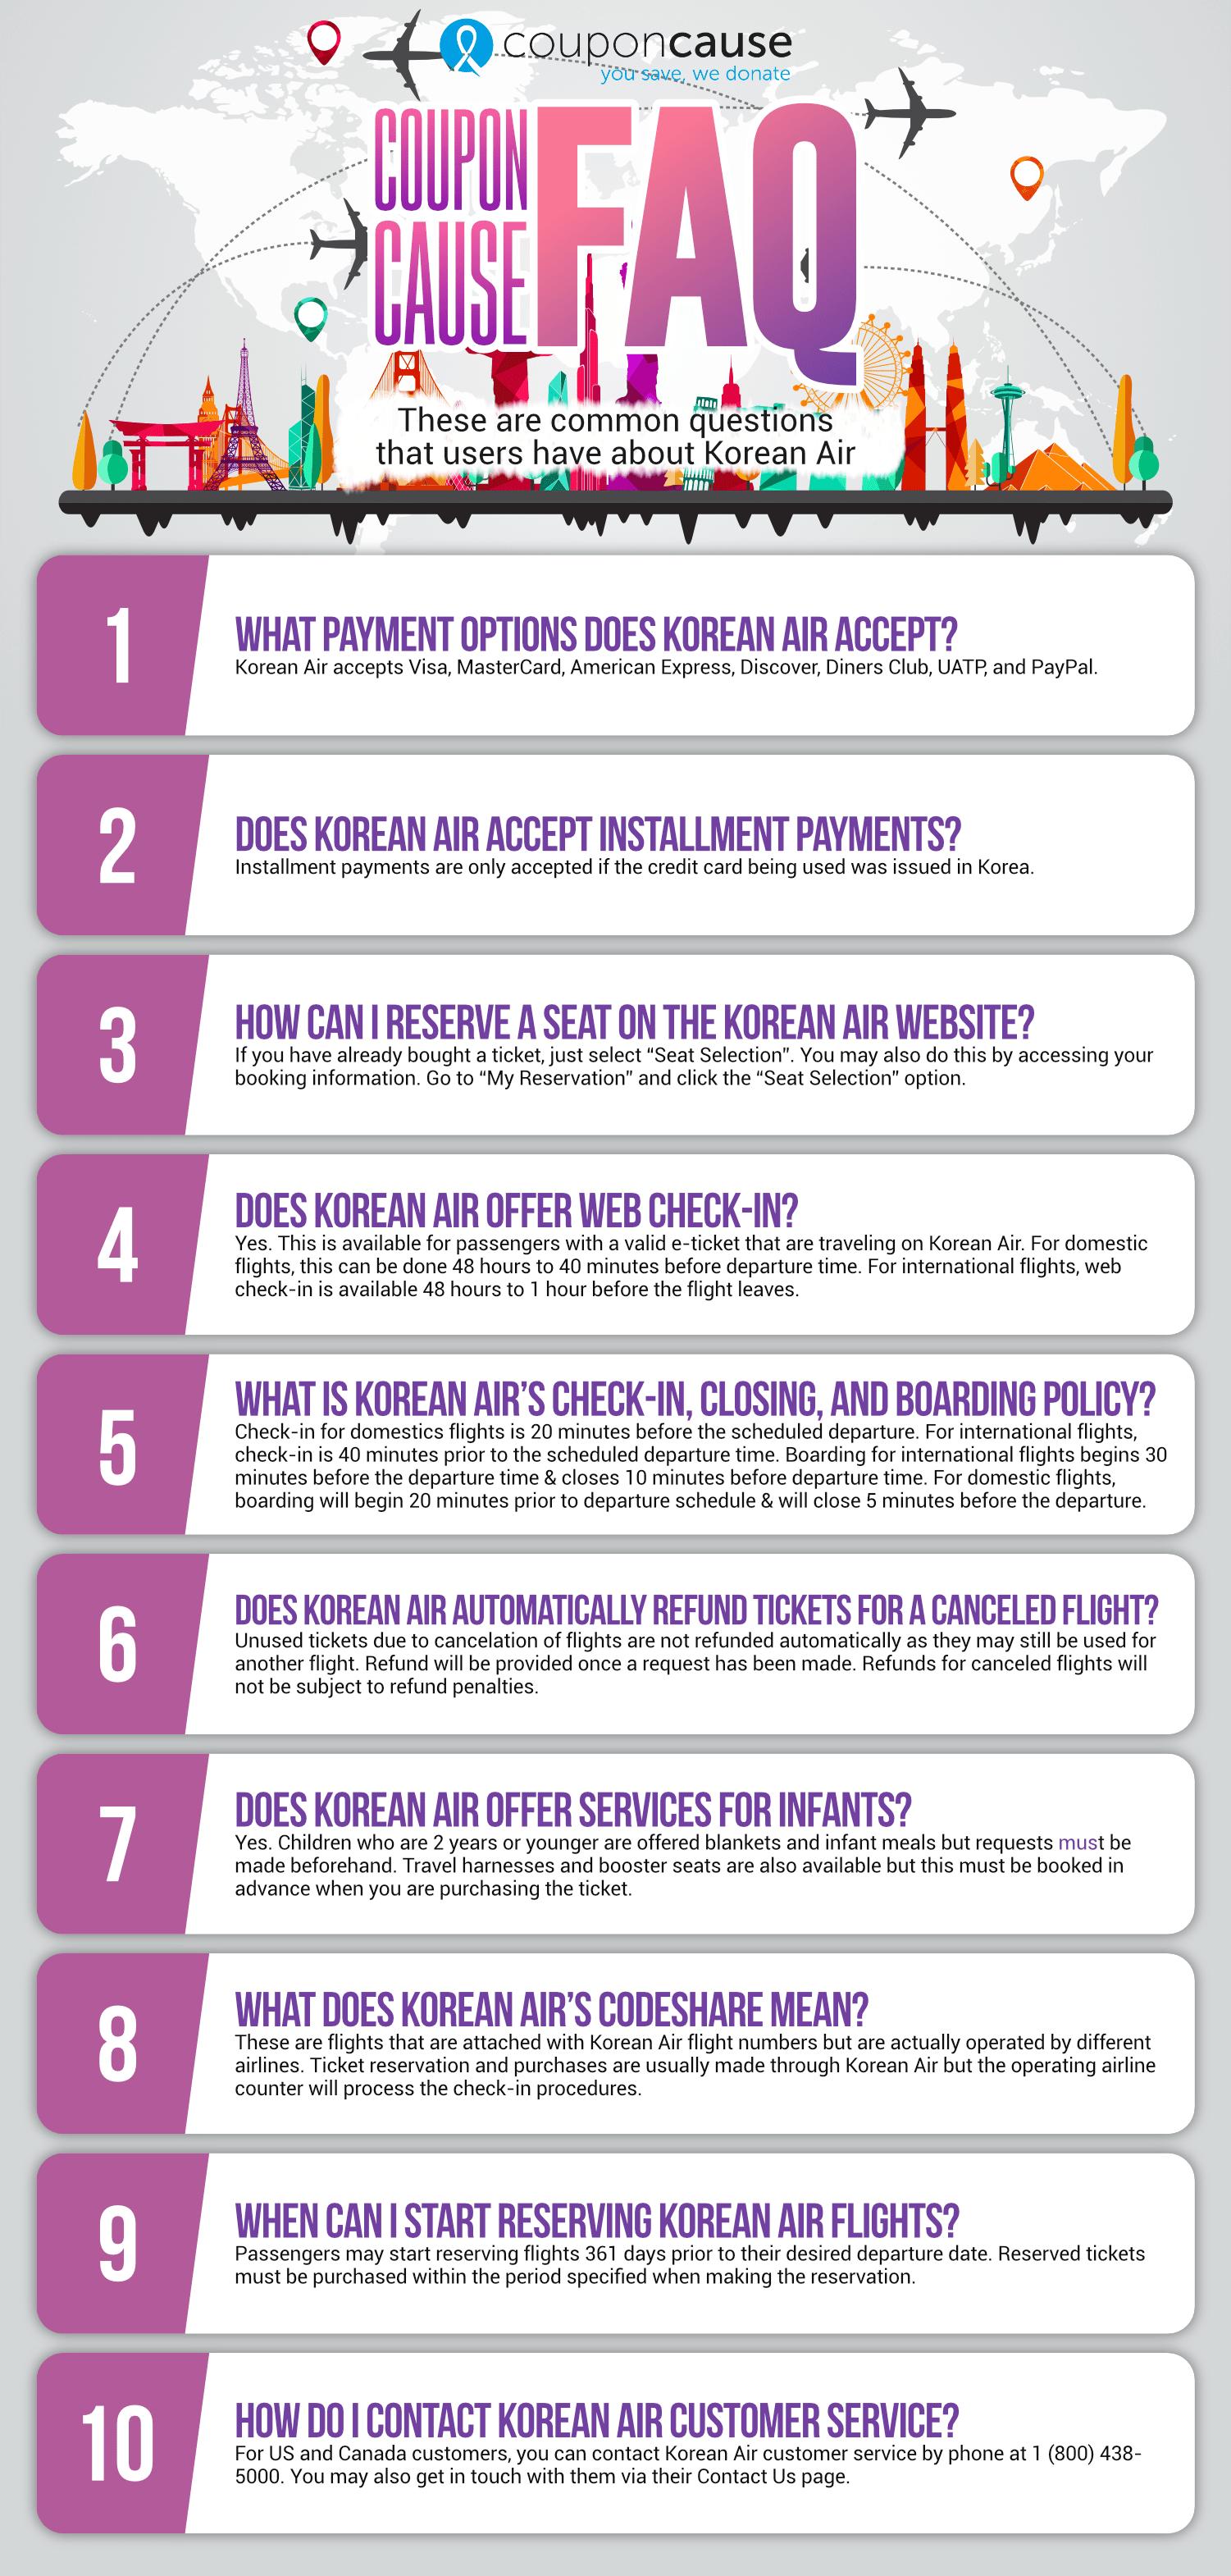 Korean Air Infographic Order Coupon Cause FAQ (C.C. FAQ)